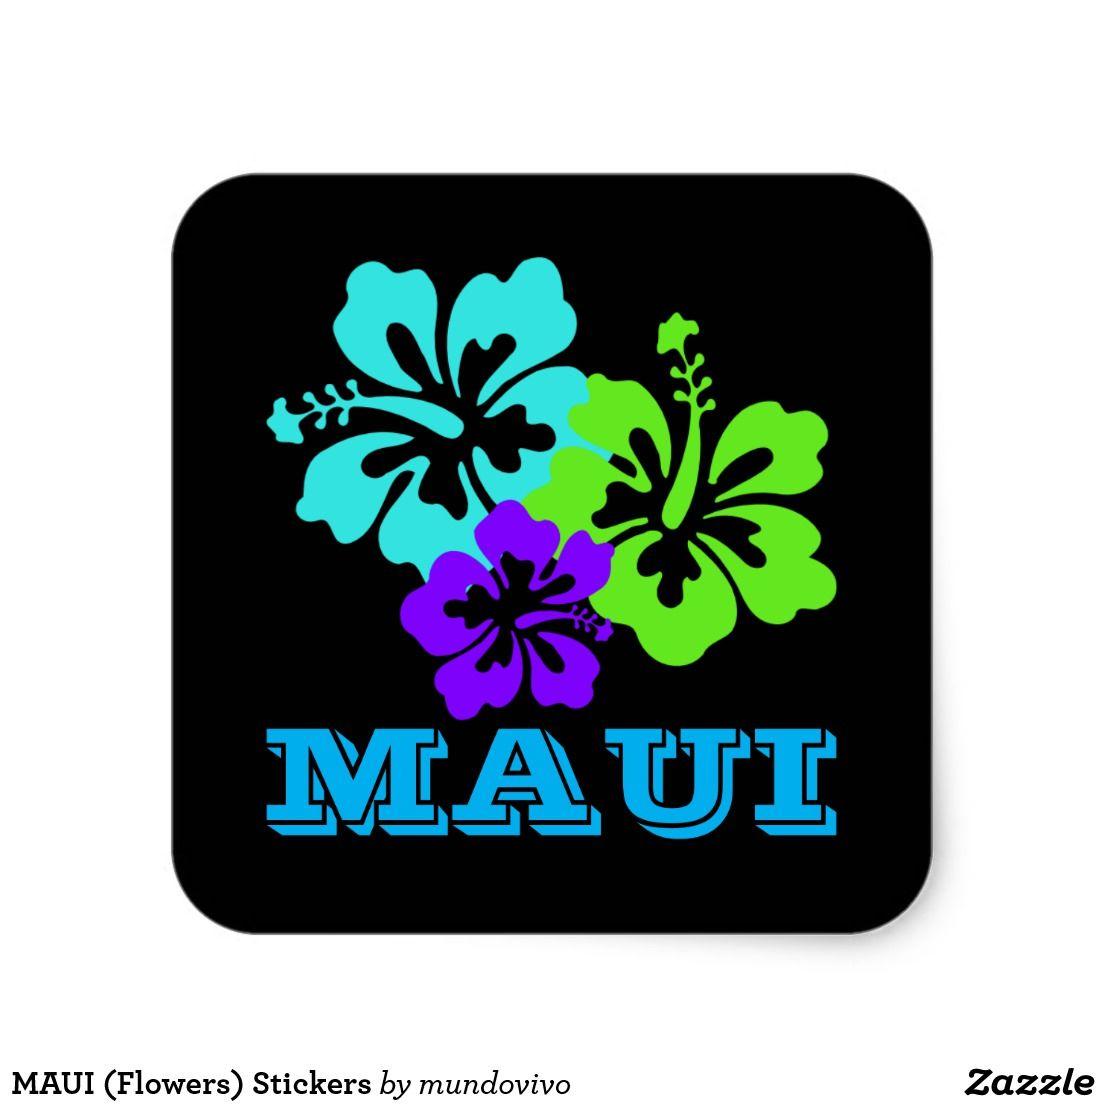 Maui Flowers Stickers Zazzle Com Black Stickers Purple Hibiscus Flowers [ 1106 x 1106 Pixel ]